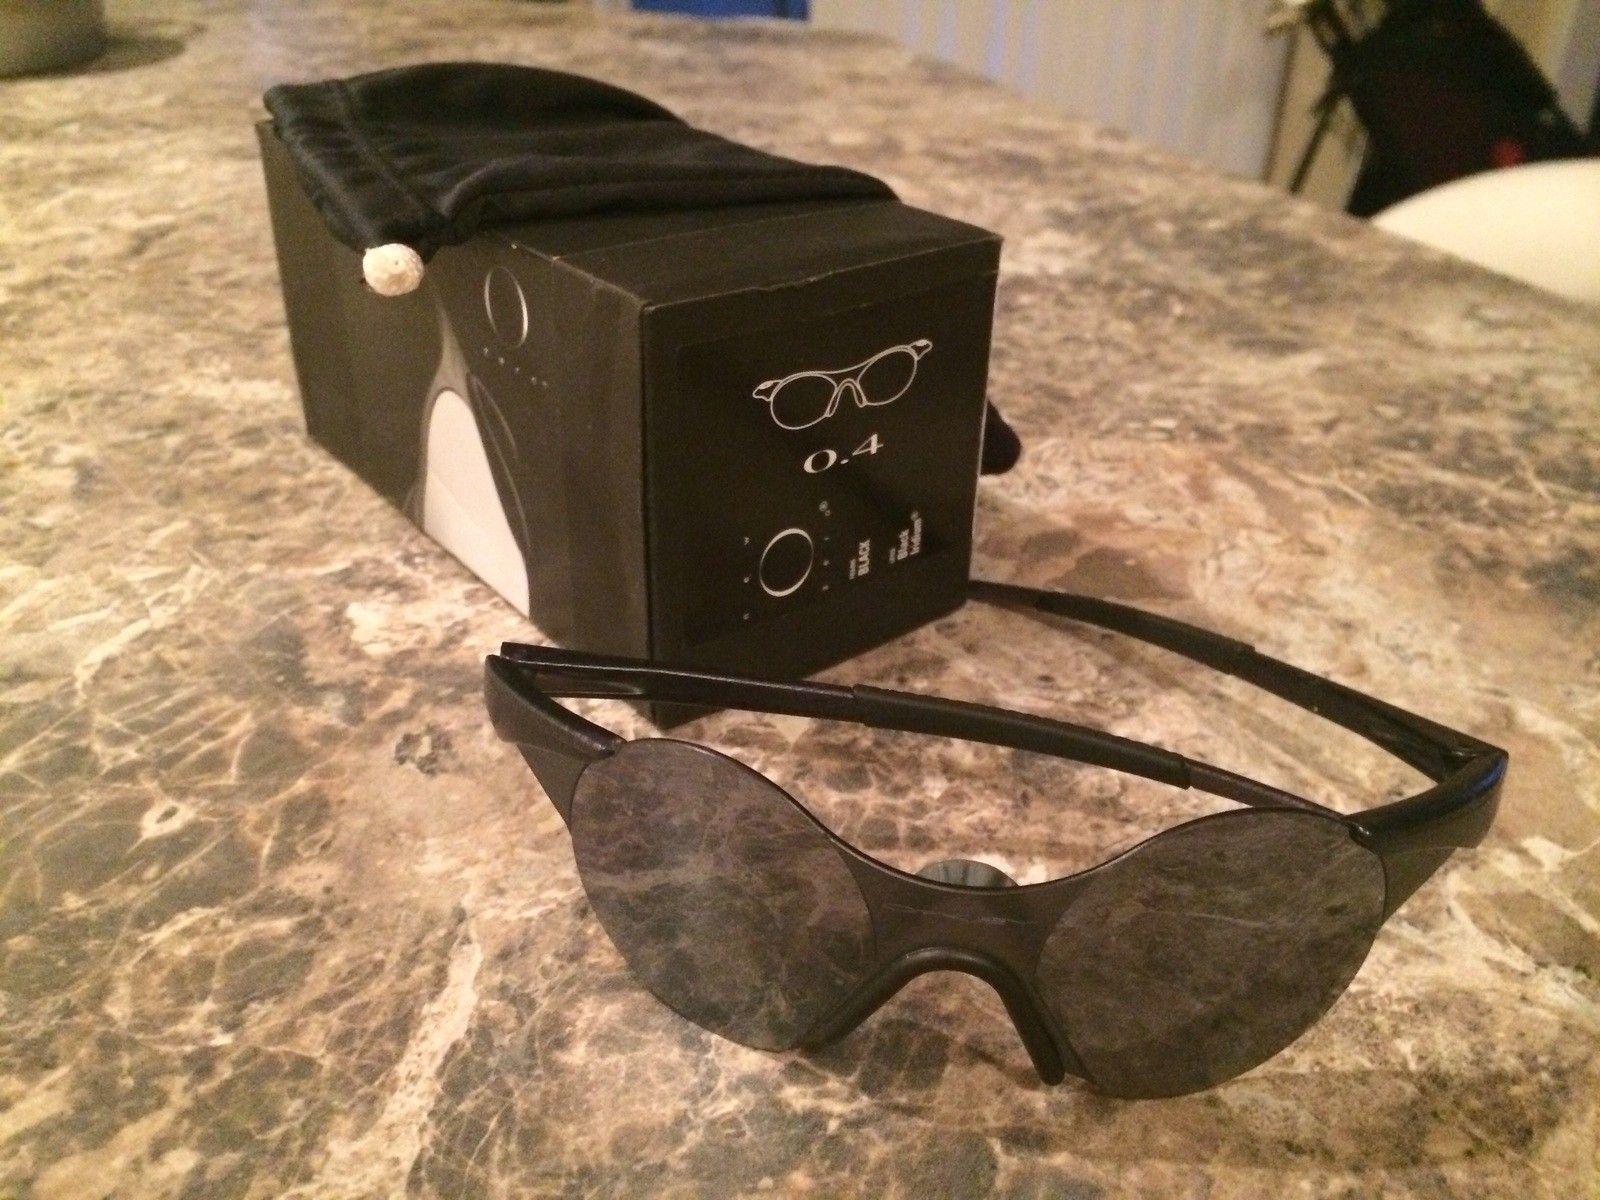 Oakley Zero .04 black/black iridium for sale - image.jpg